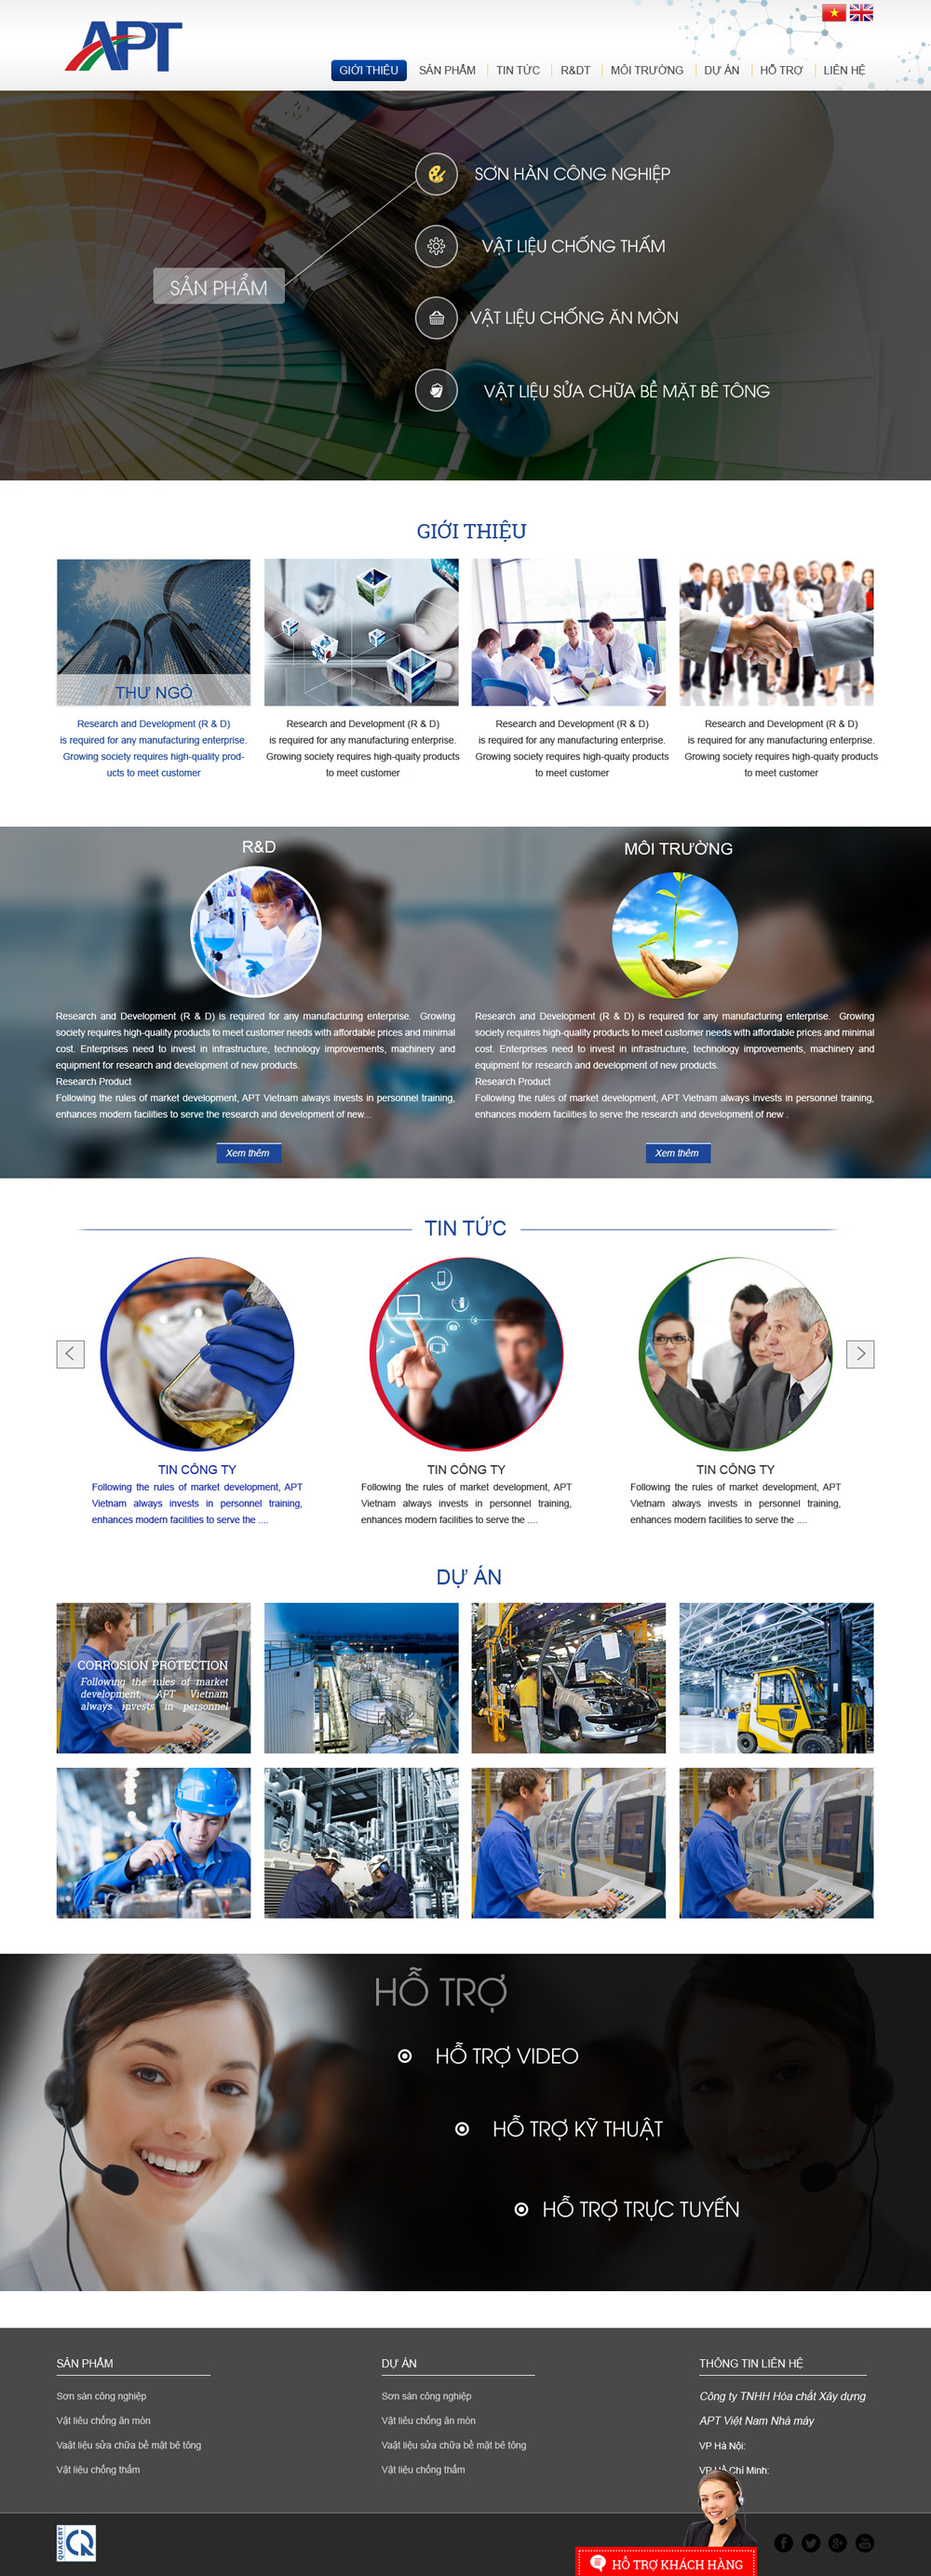 Thiết kế website APT